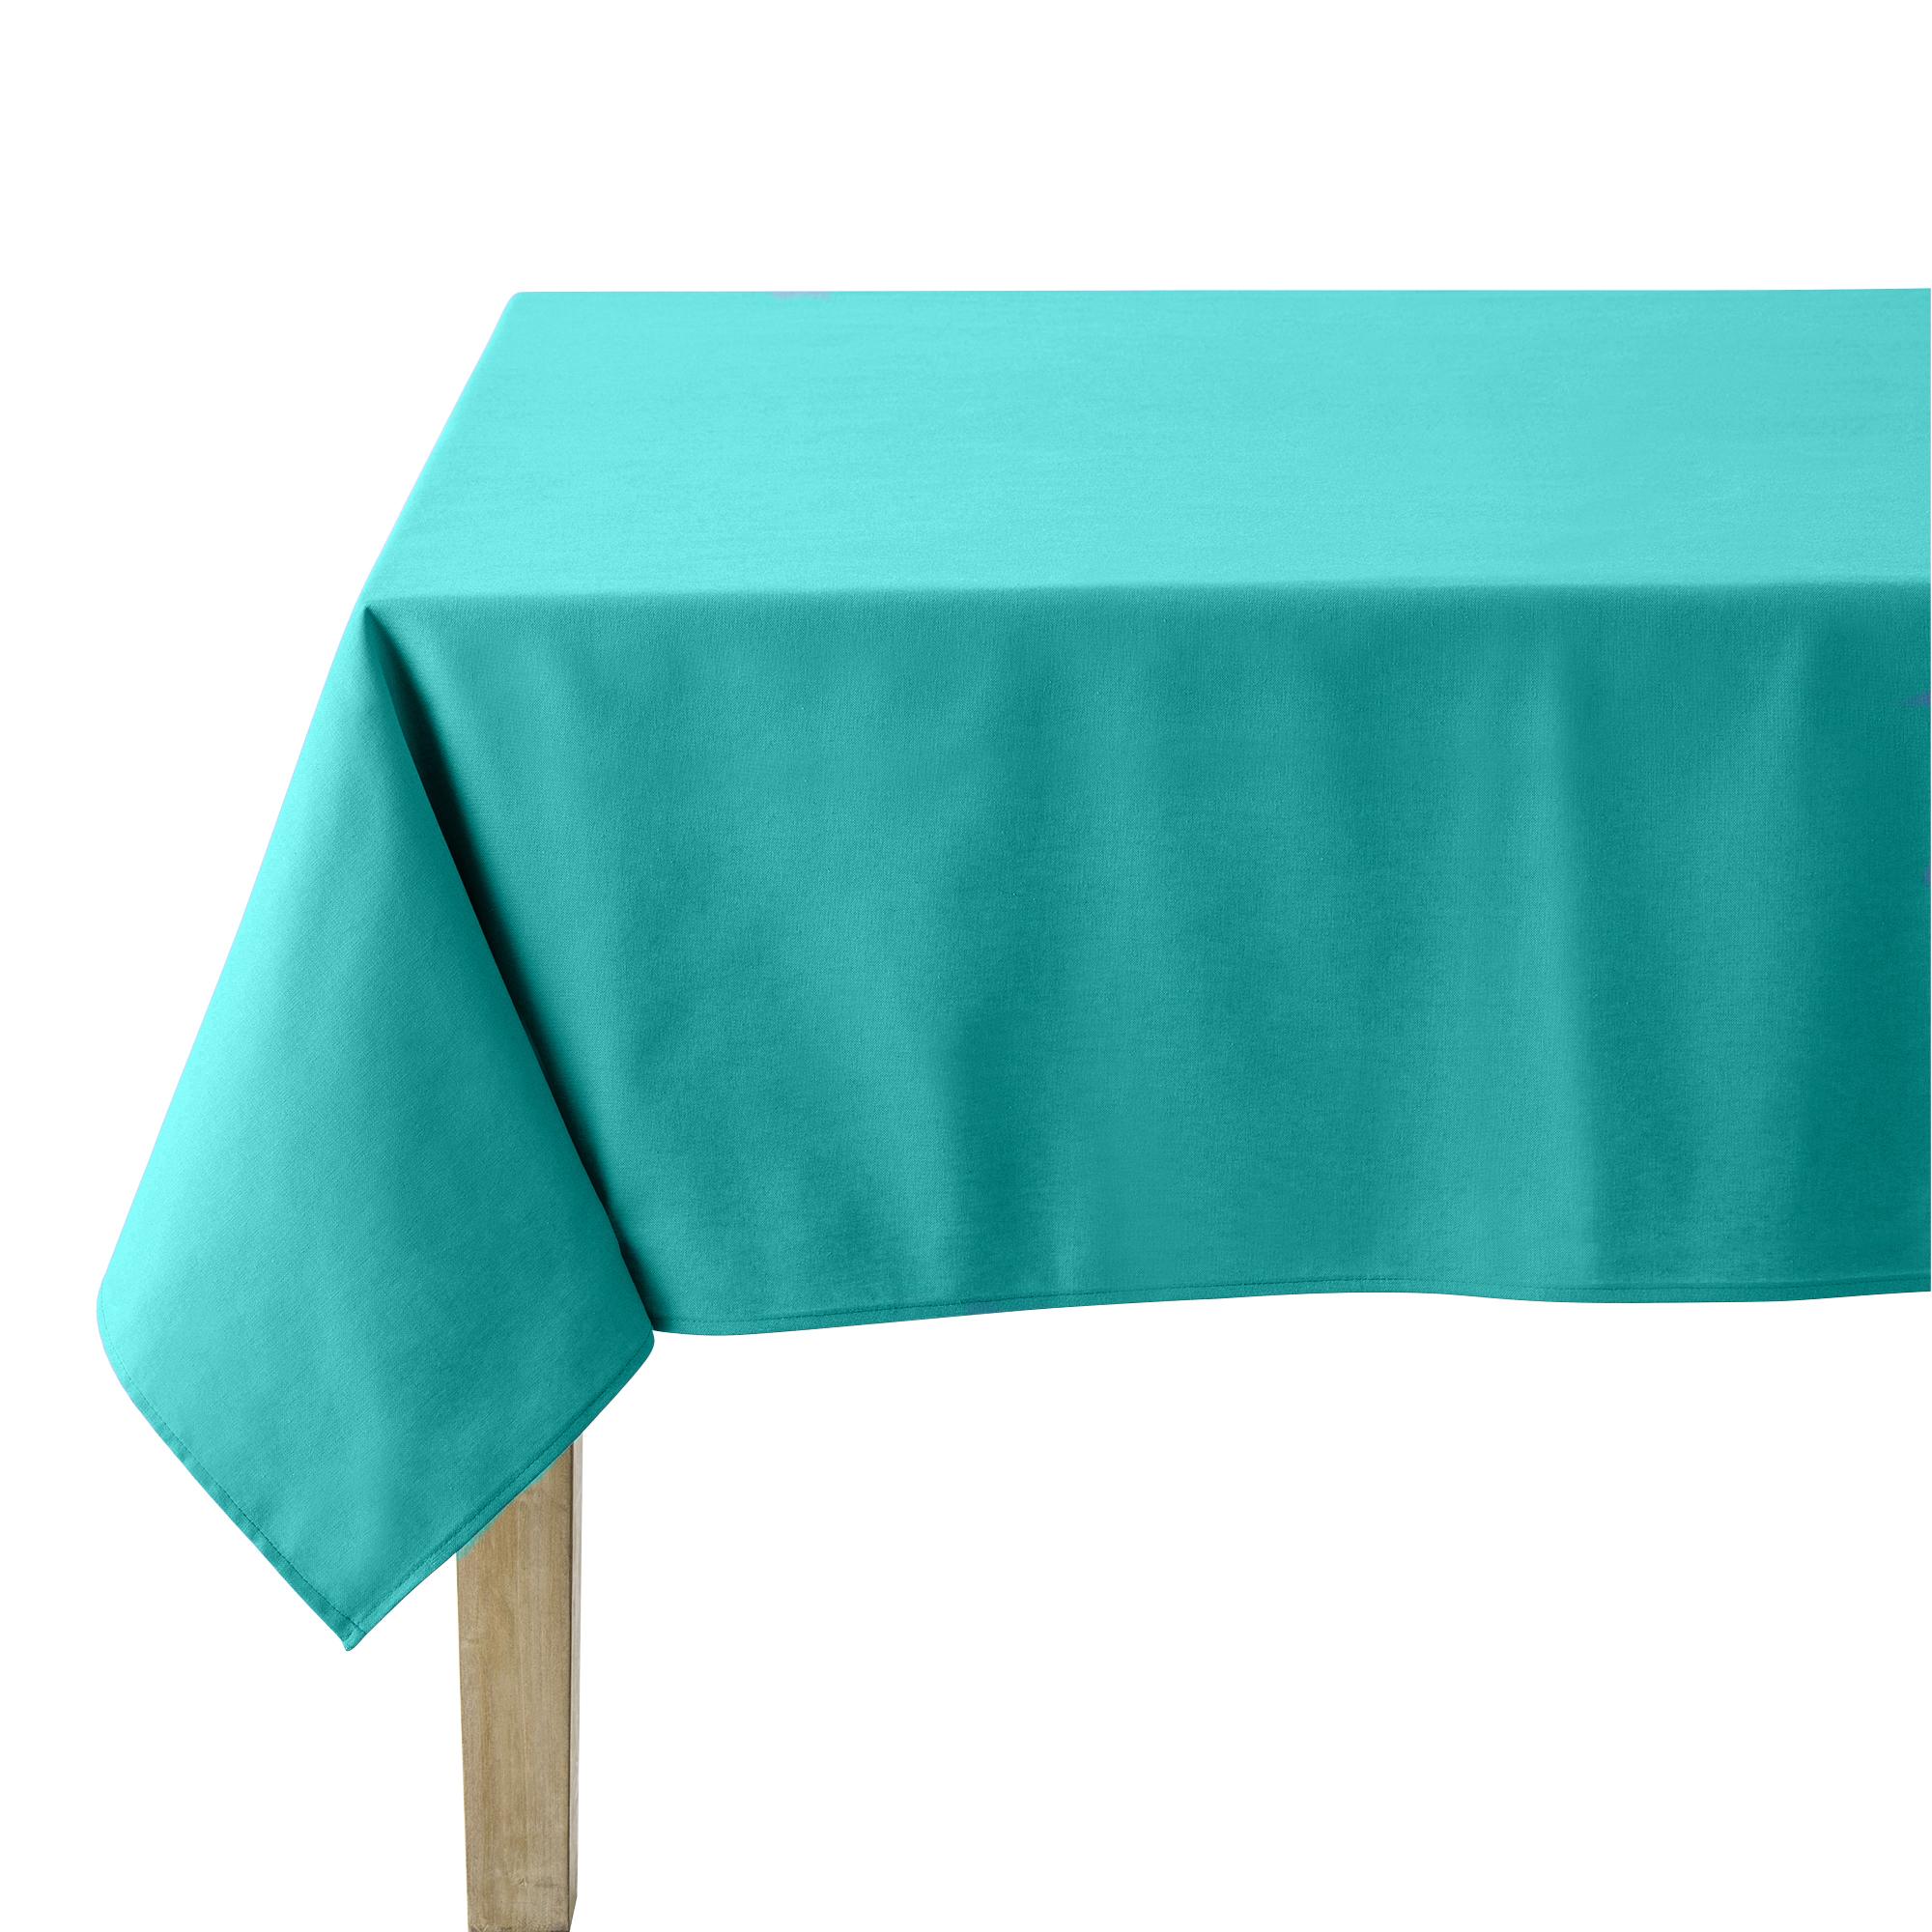 Nappe en coton traitee teflon turquoise 180 x 300